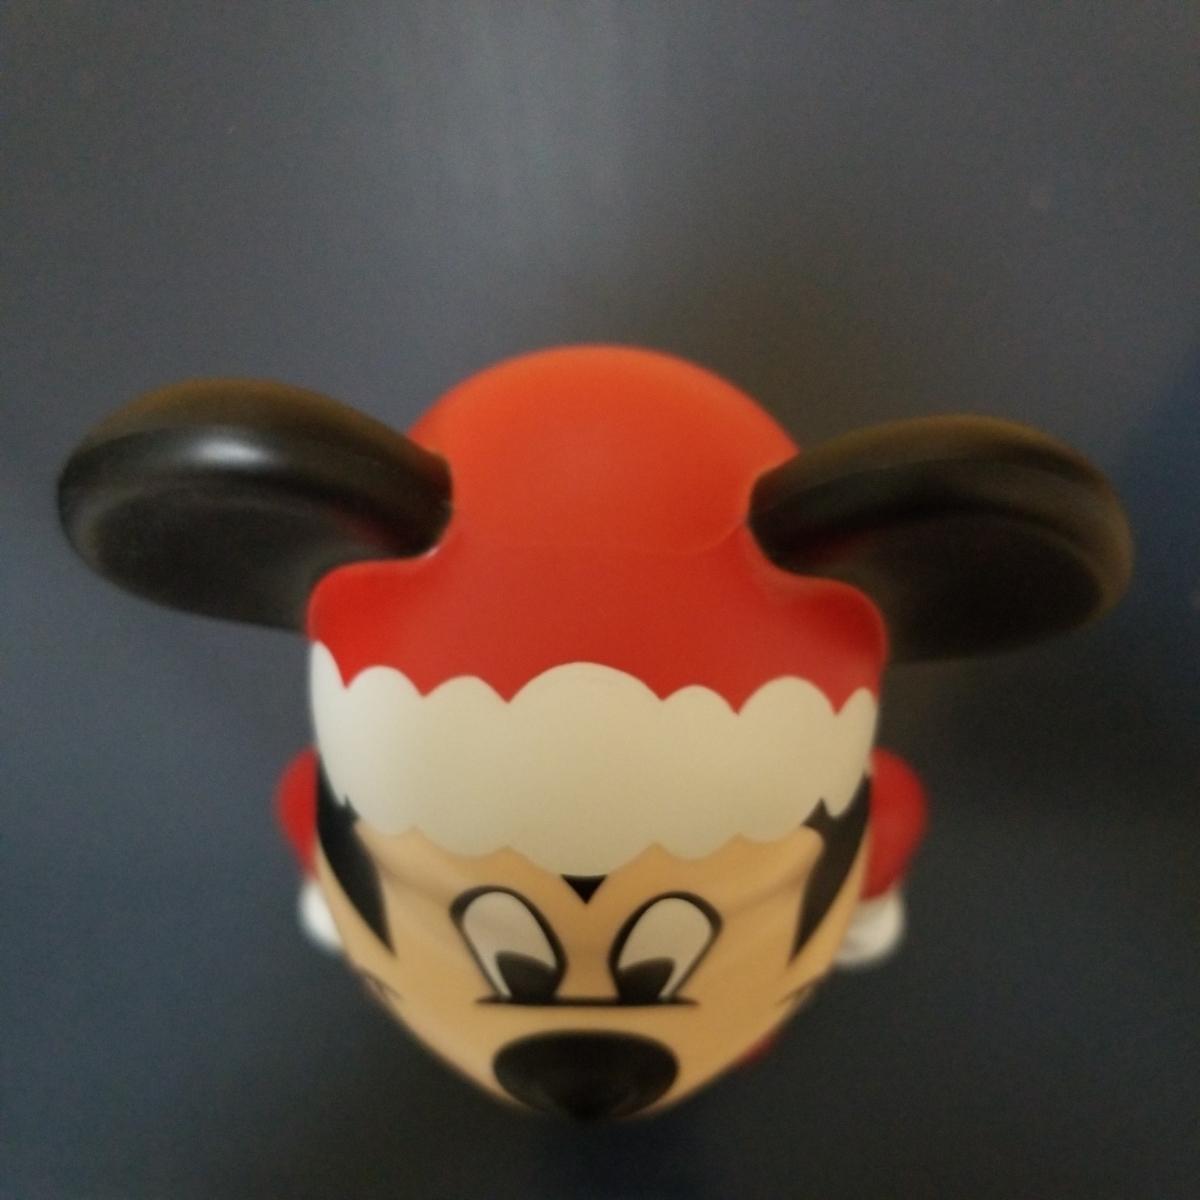 MEDICOM TOY メディコムトイ BE@RBRICK ベアブリック ミッキーマウス サンタver 特賞 400% サンタクロース_画像10